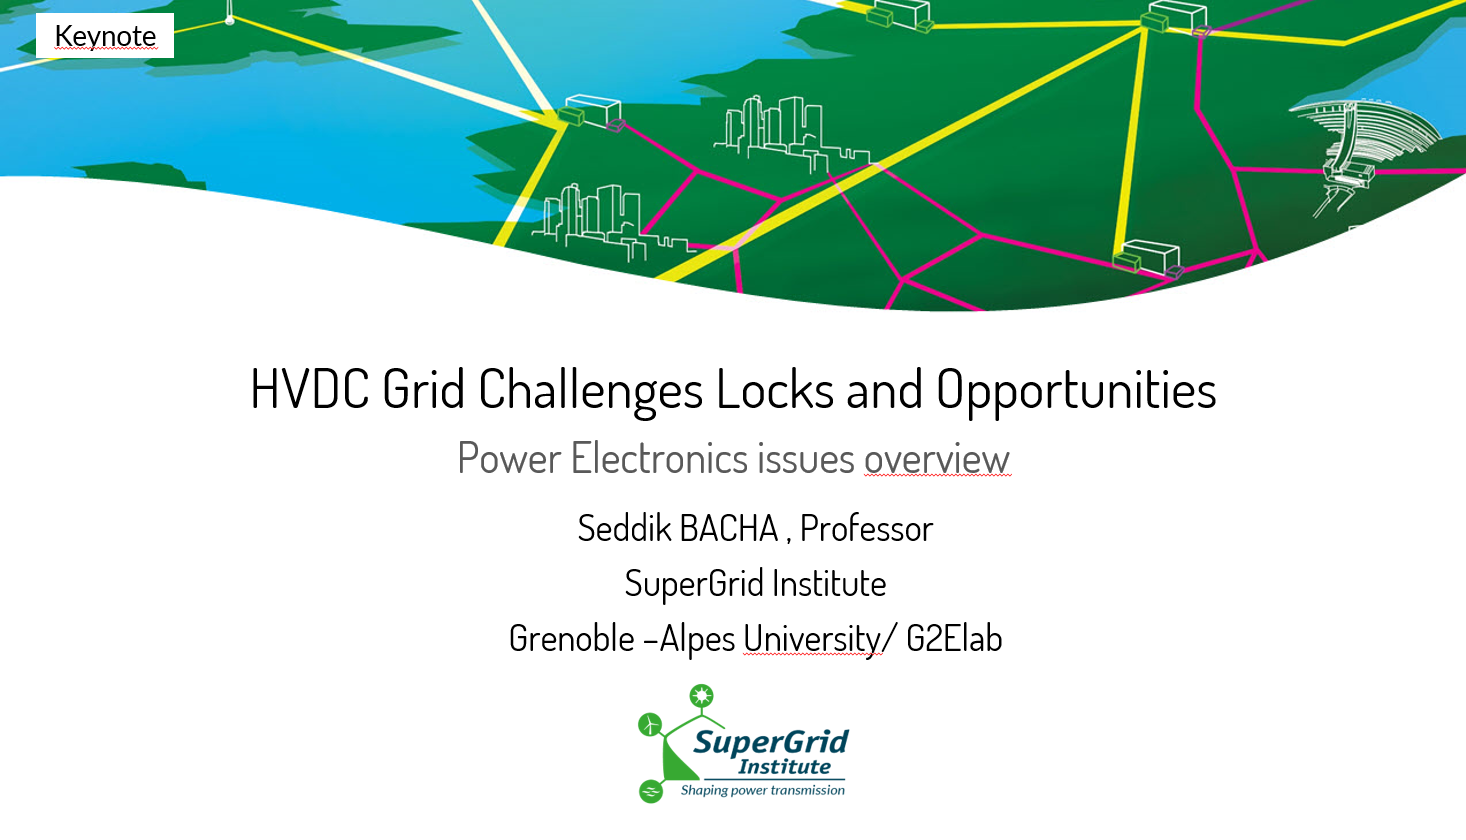 Seddik Bacha's keynote presentation at PCIM Europe 2021 is now available online